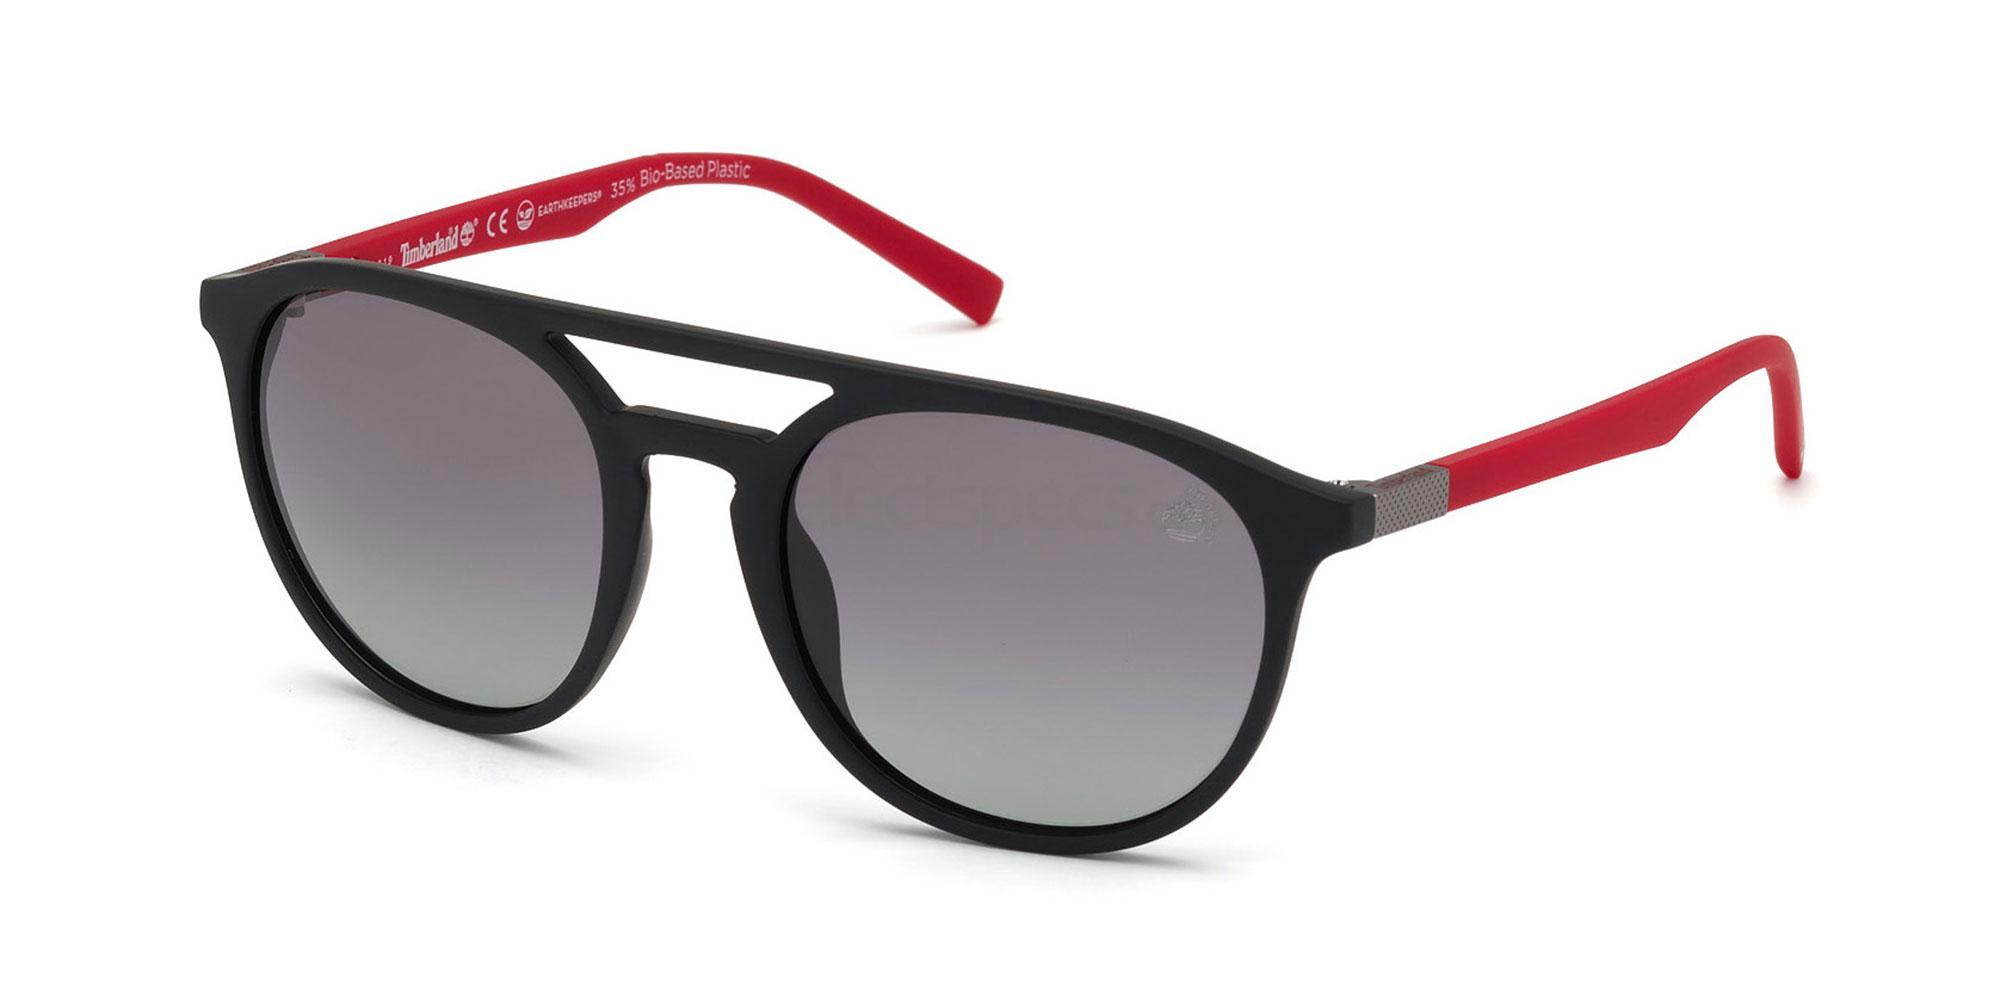 02D TB9199 Sunglasses, Timberland